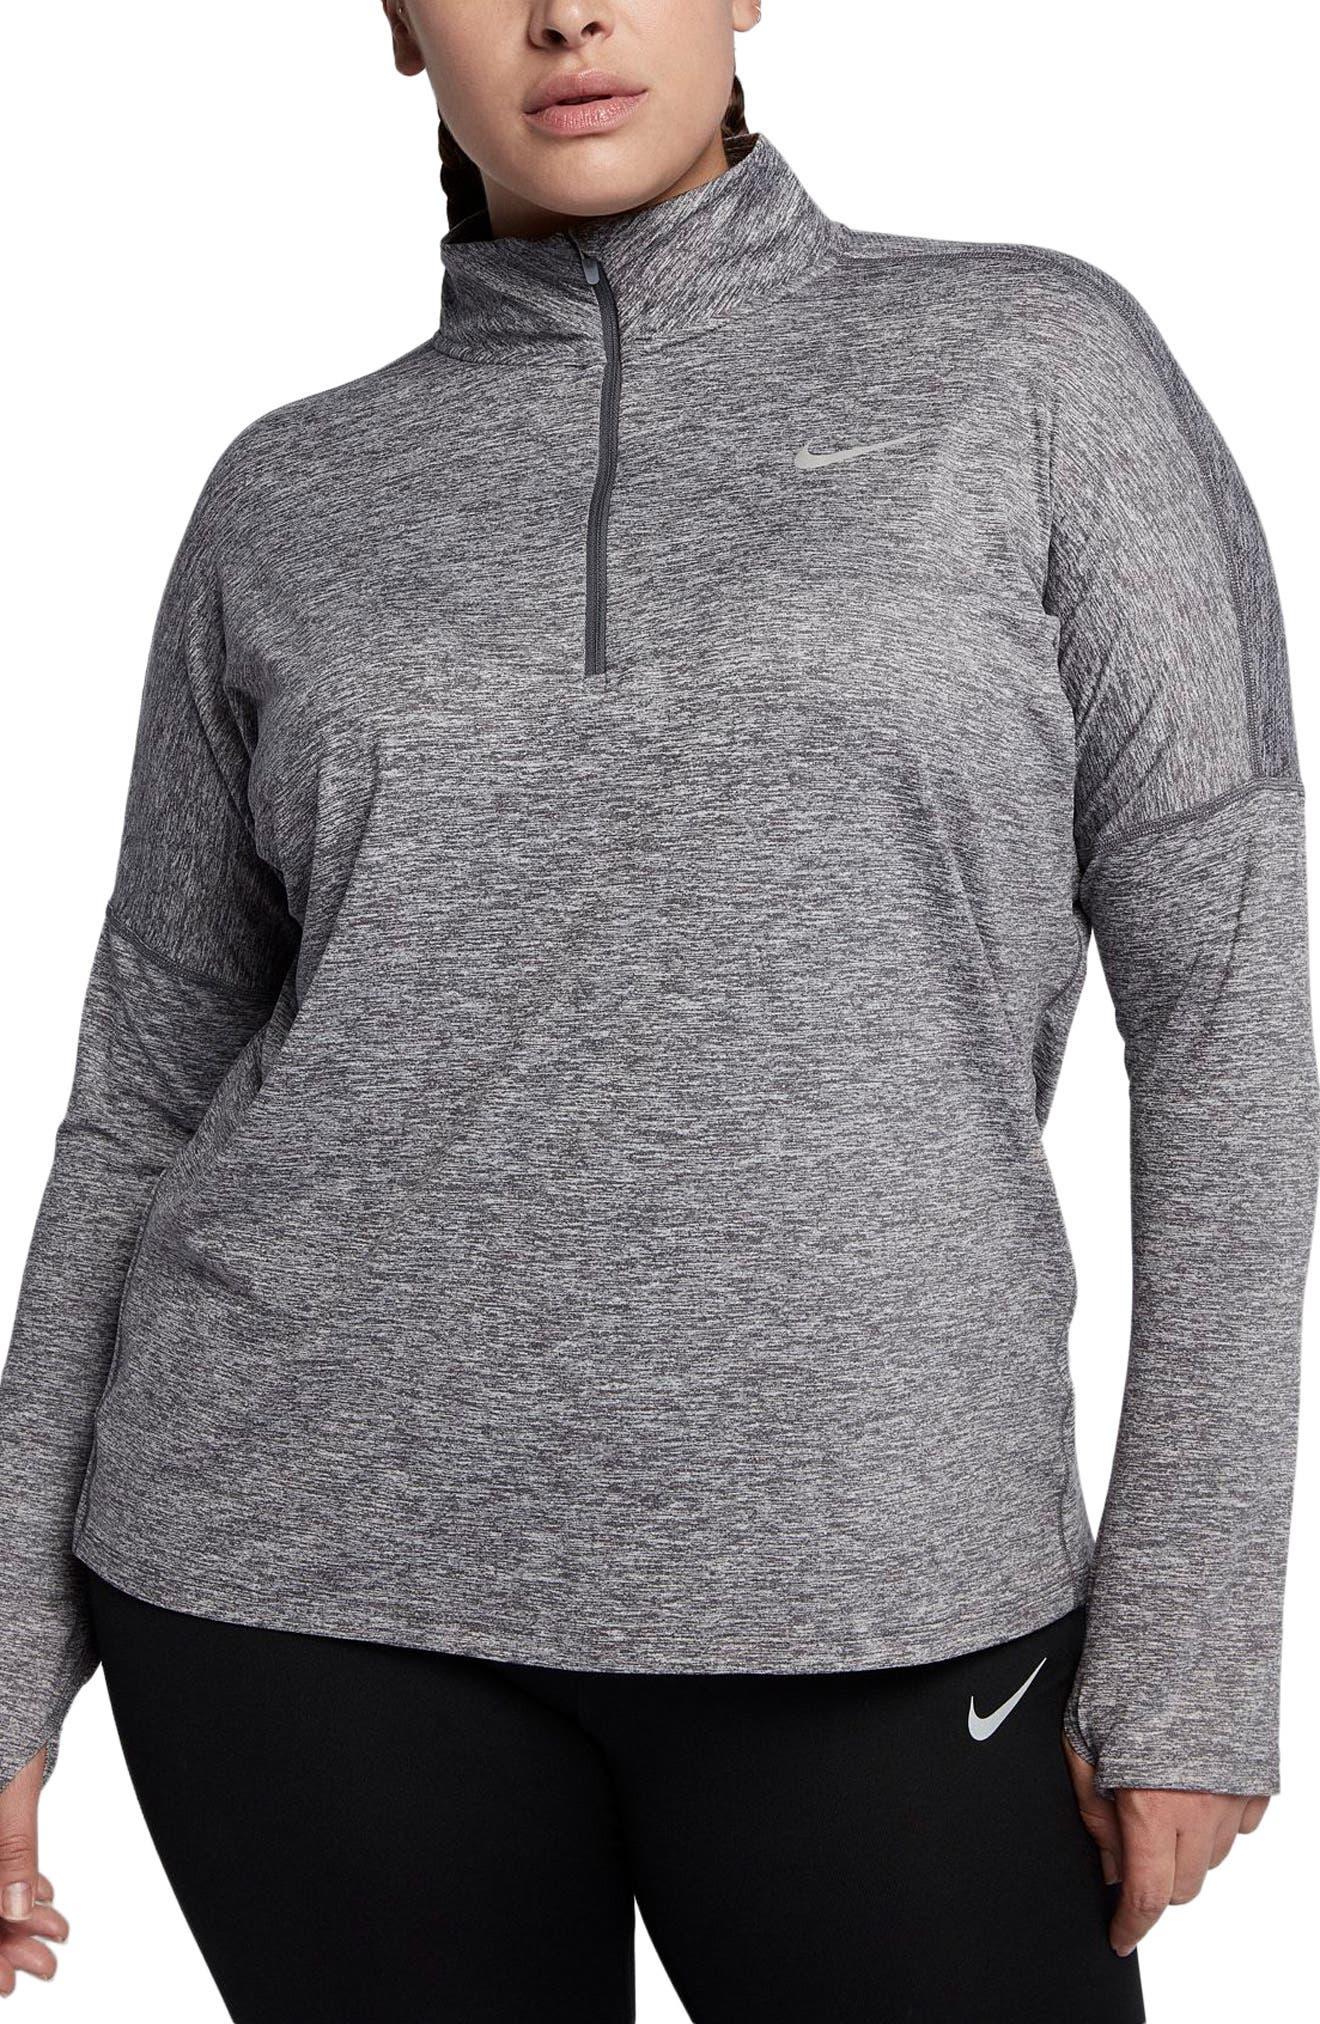 Main Image - Nike Dry Element Half Zip Top (Plus Size)